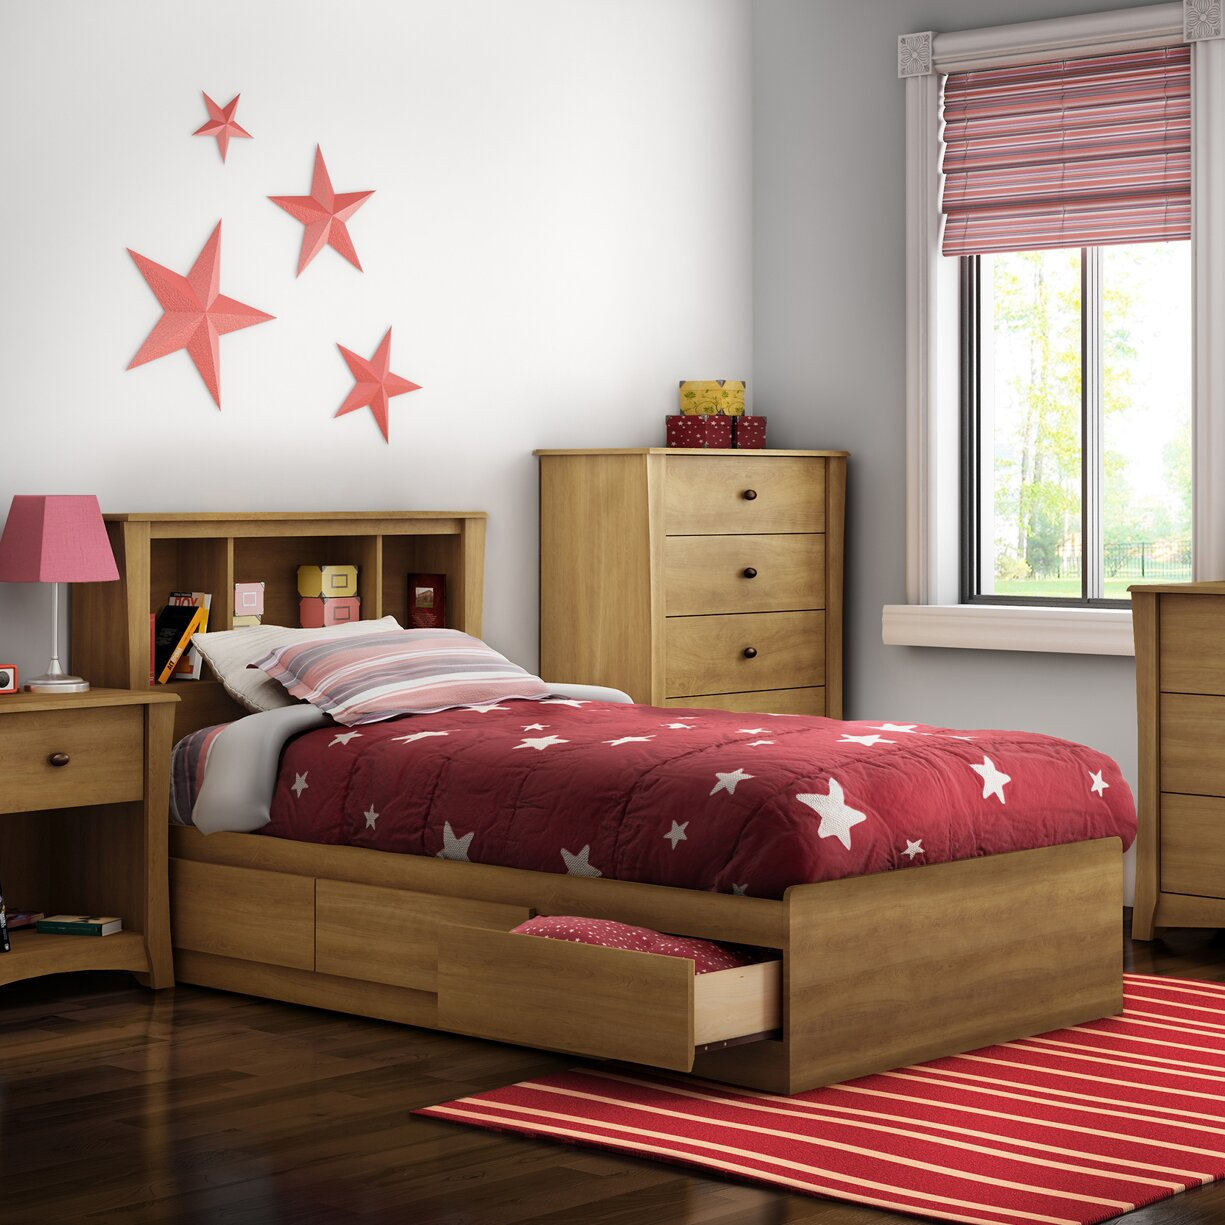 South shore jumper twin platform customizable bedroom set - South shore furniture bedroom sets ...